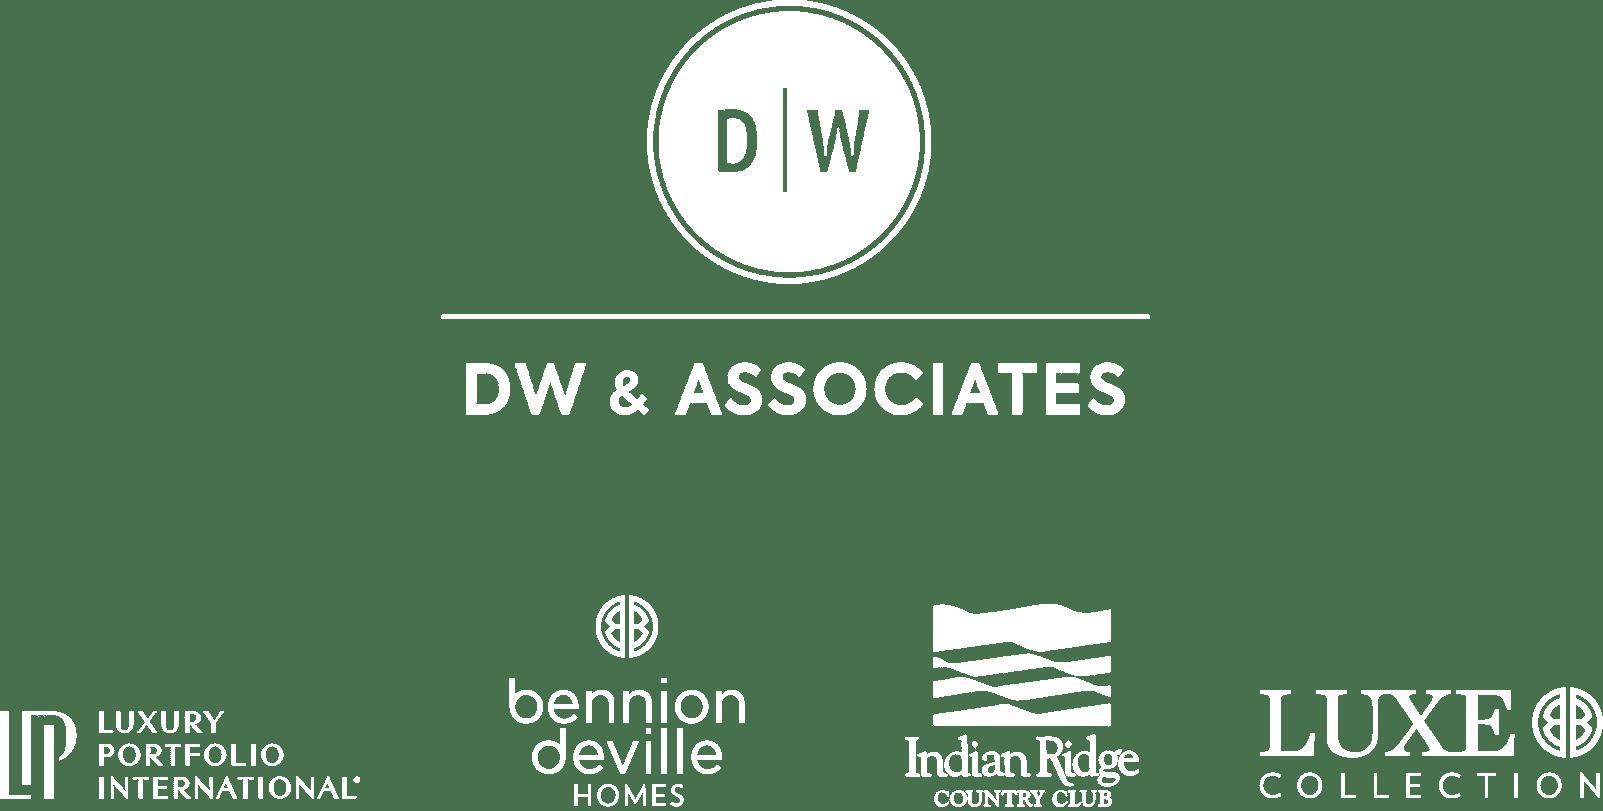 DW & Associates